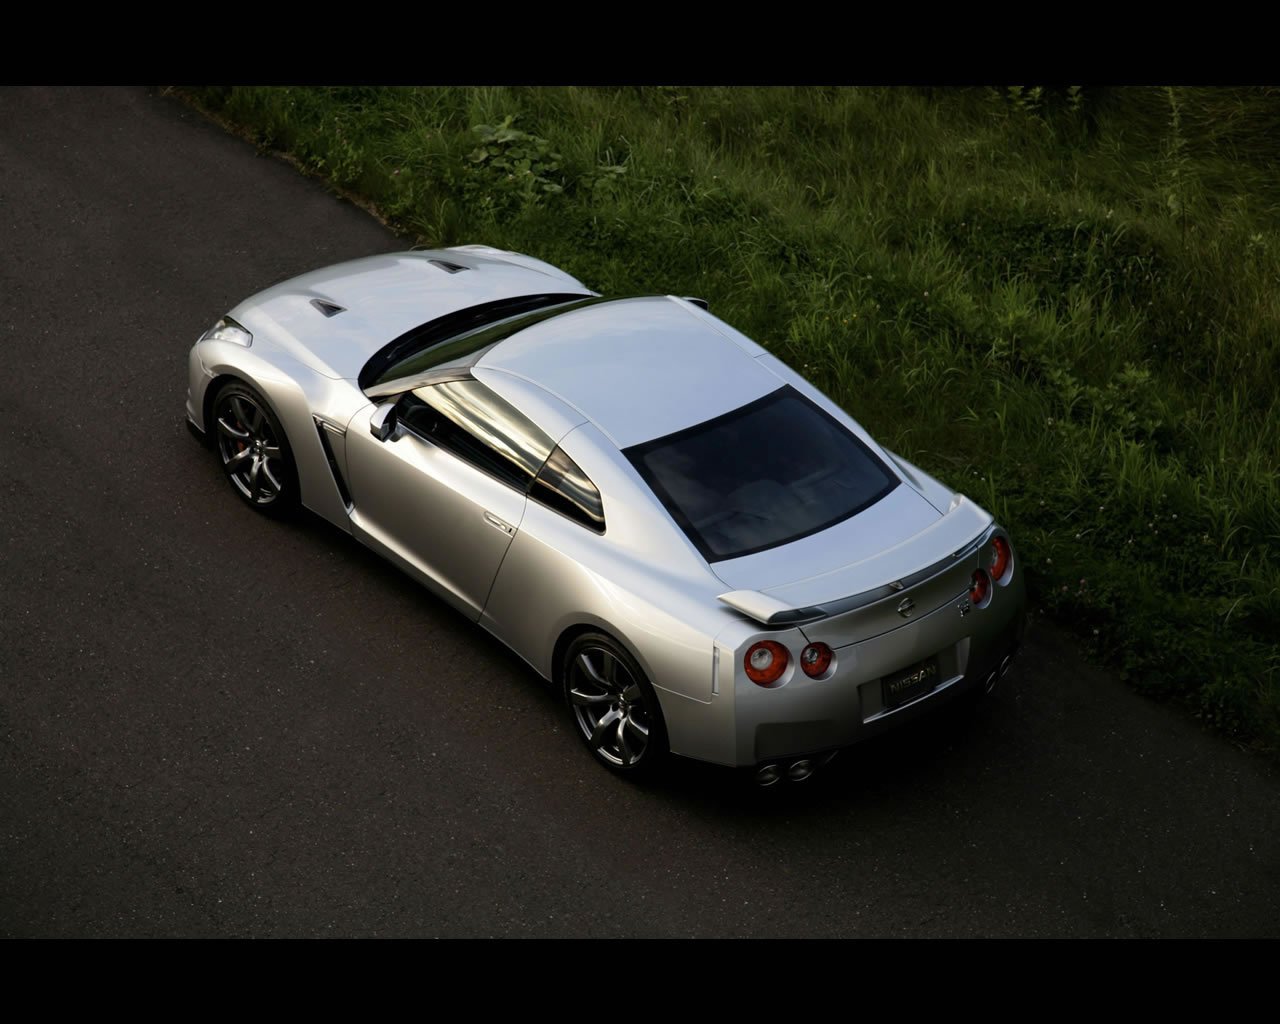 Nissan Gtr Concept >> Nissan GTR / Nissan GTR 8_jpg.jpg